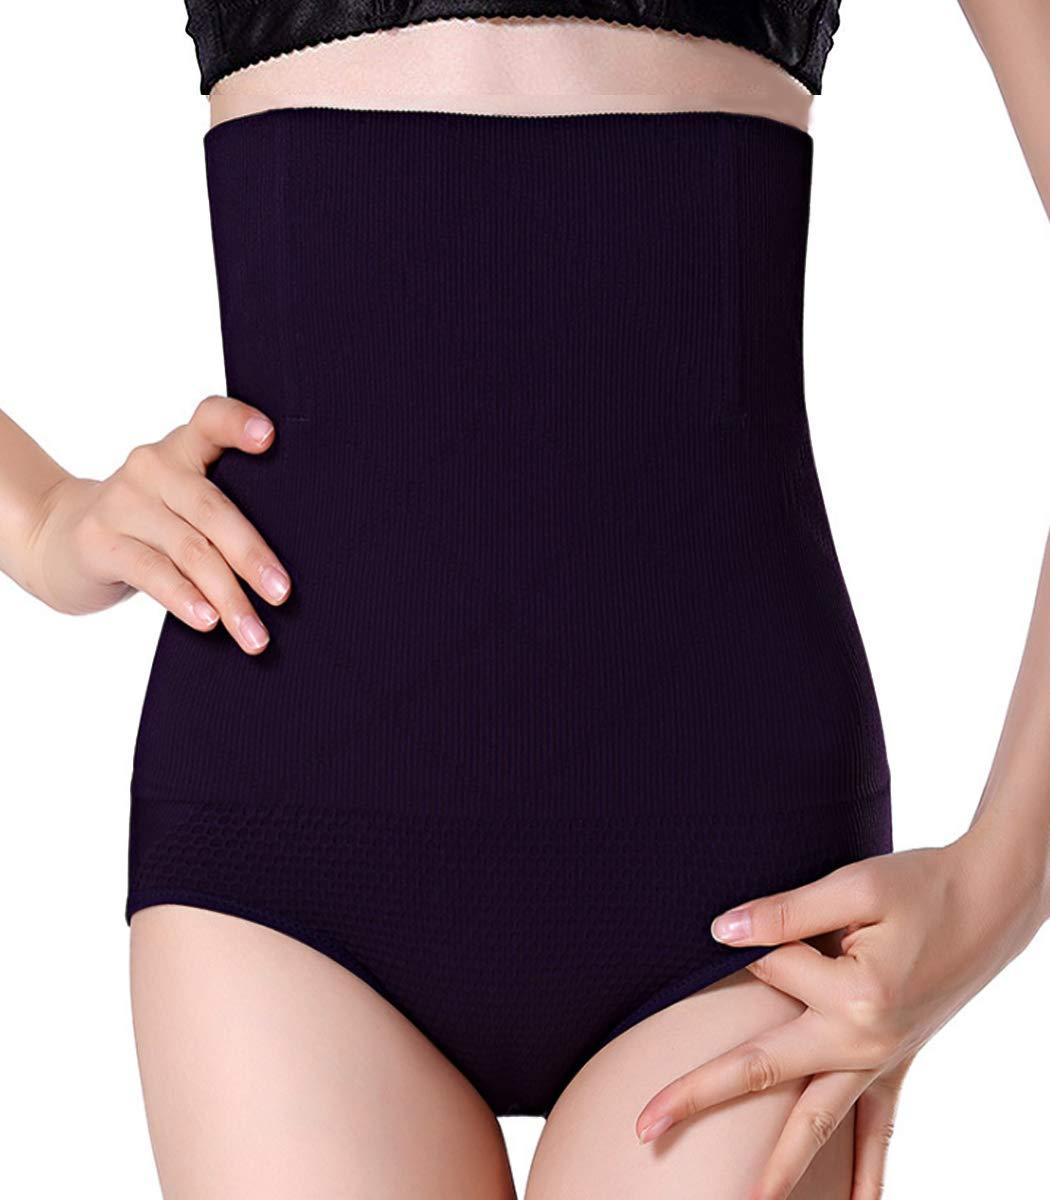 AYEABUY Womens Underwear Shapewear High Waist Butt Shaper Lifter Tummy Control Knickers AYEABUY3B000